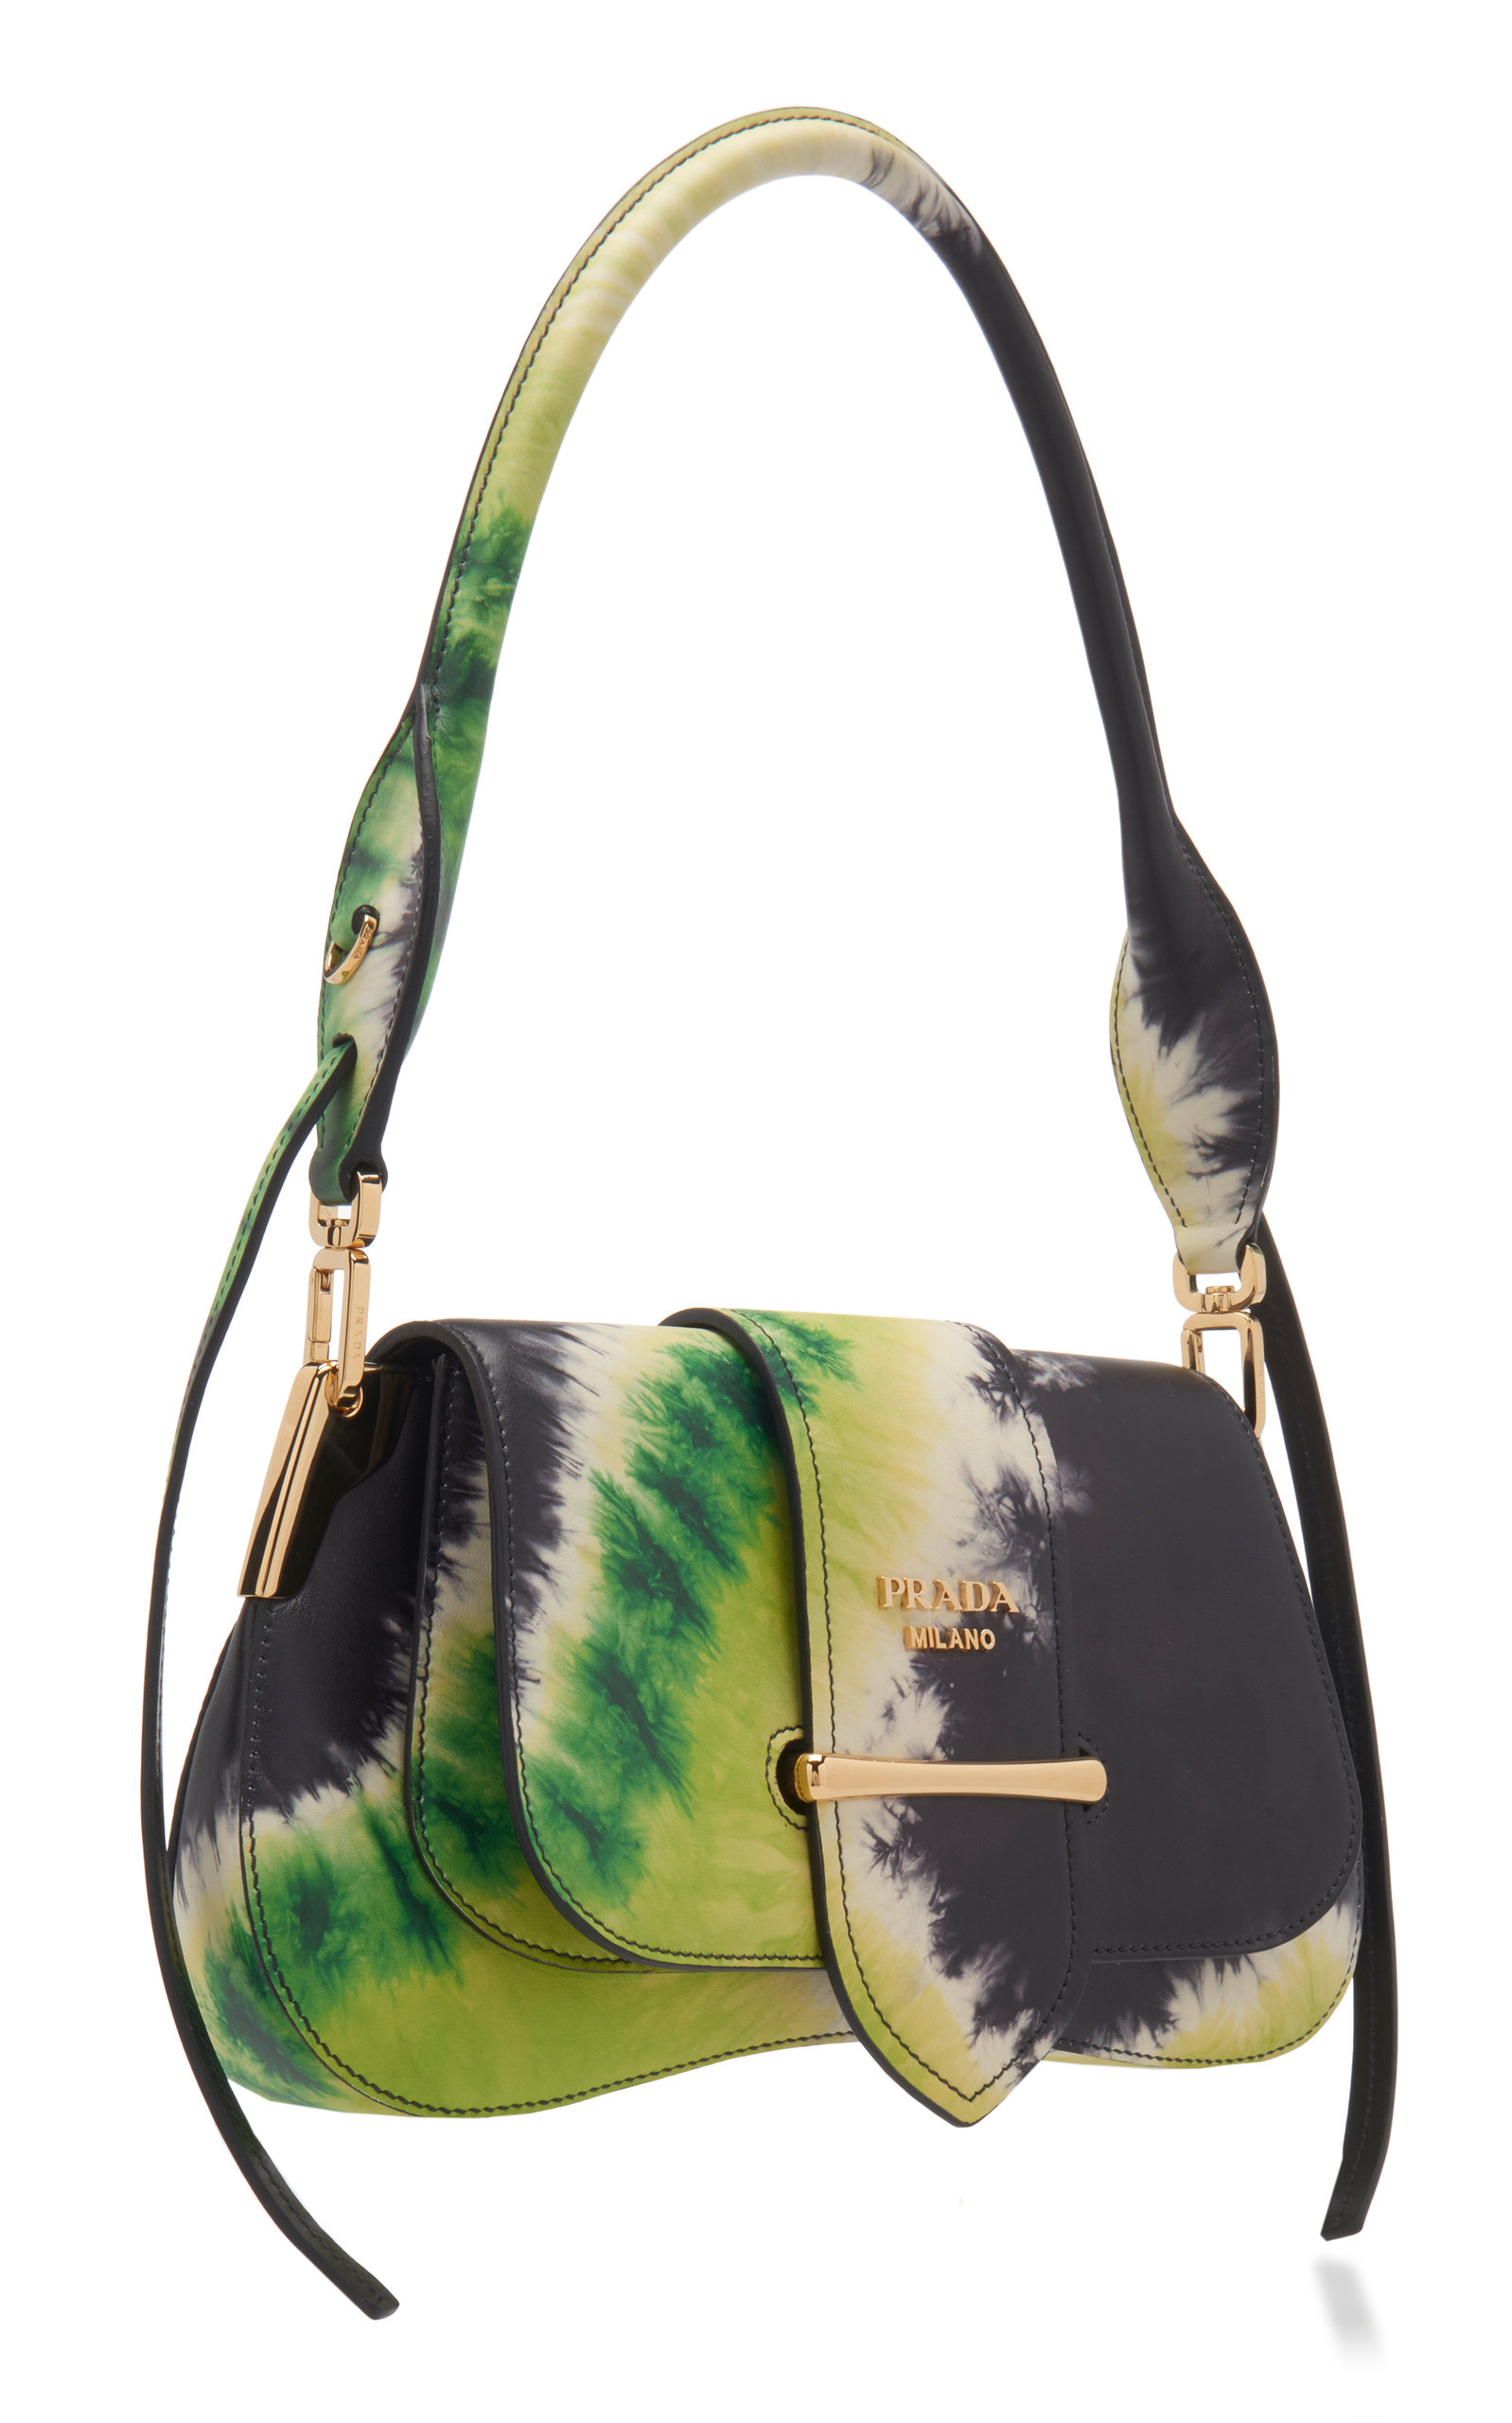 Prada Pattina Tie-Dye Leather Shoulder Bag | Tie dye leather, Alligator bag, Leather shoulder bag